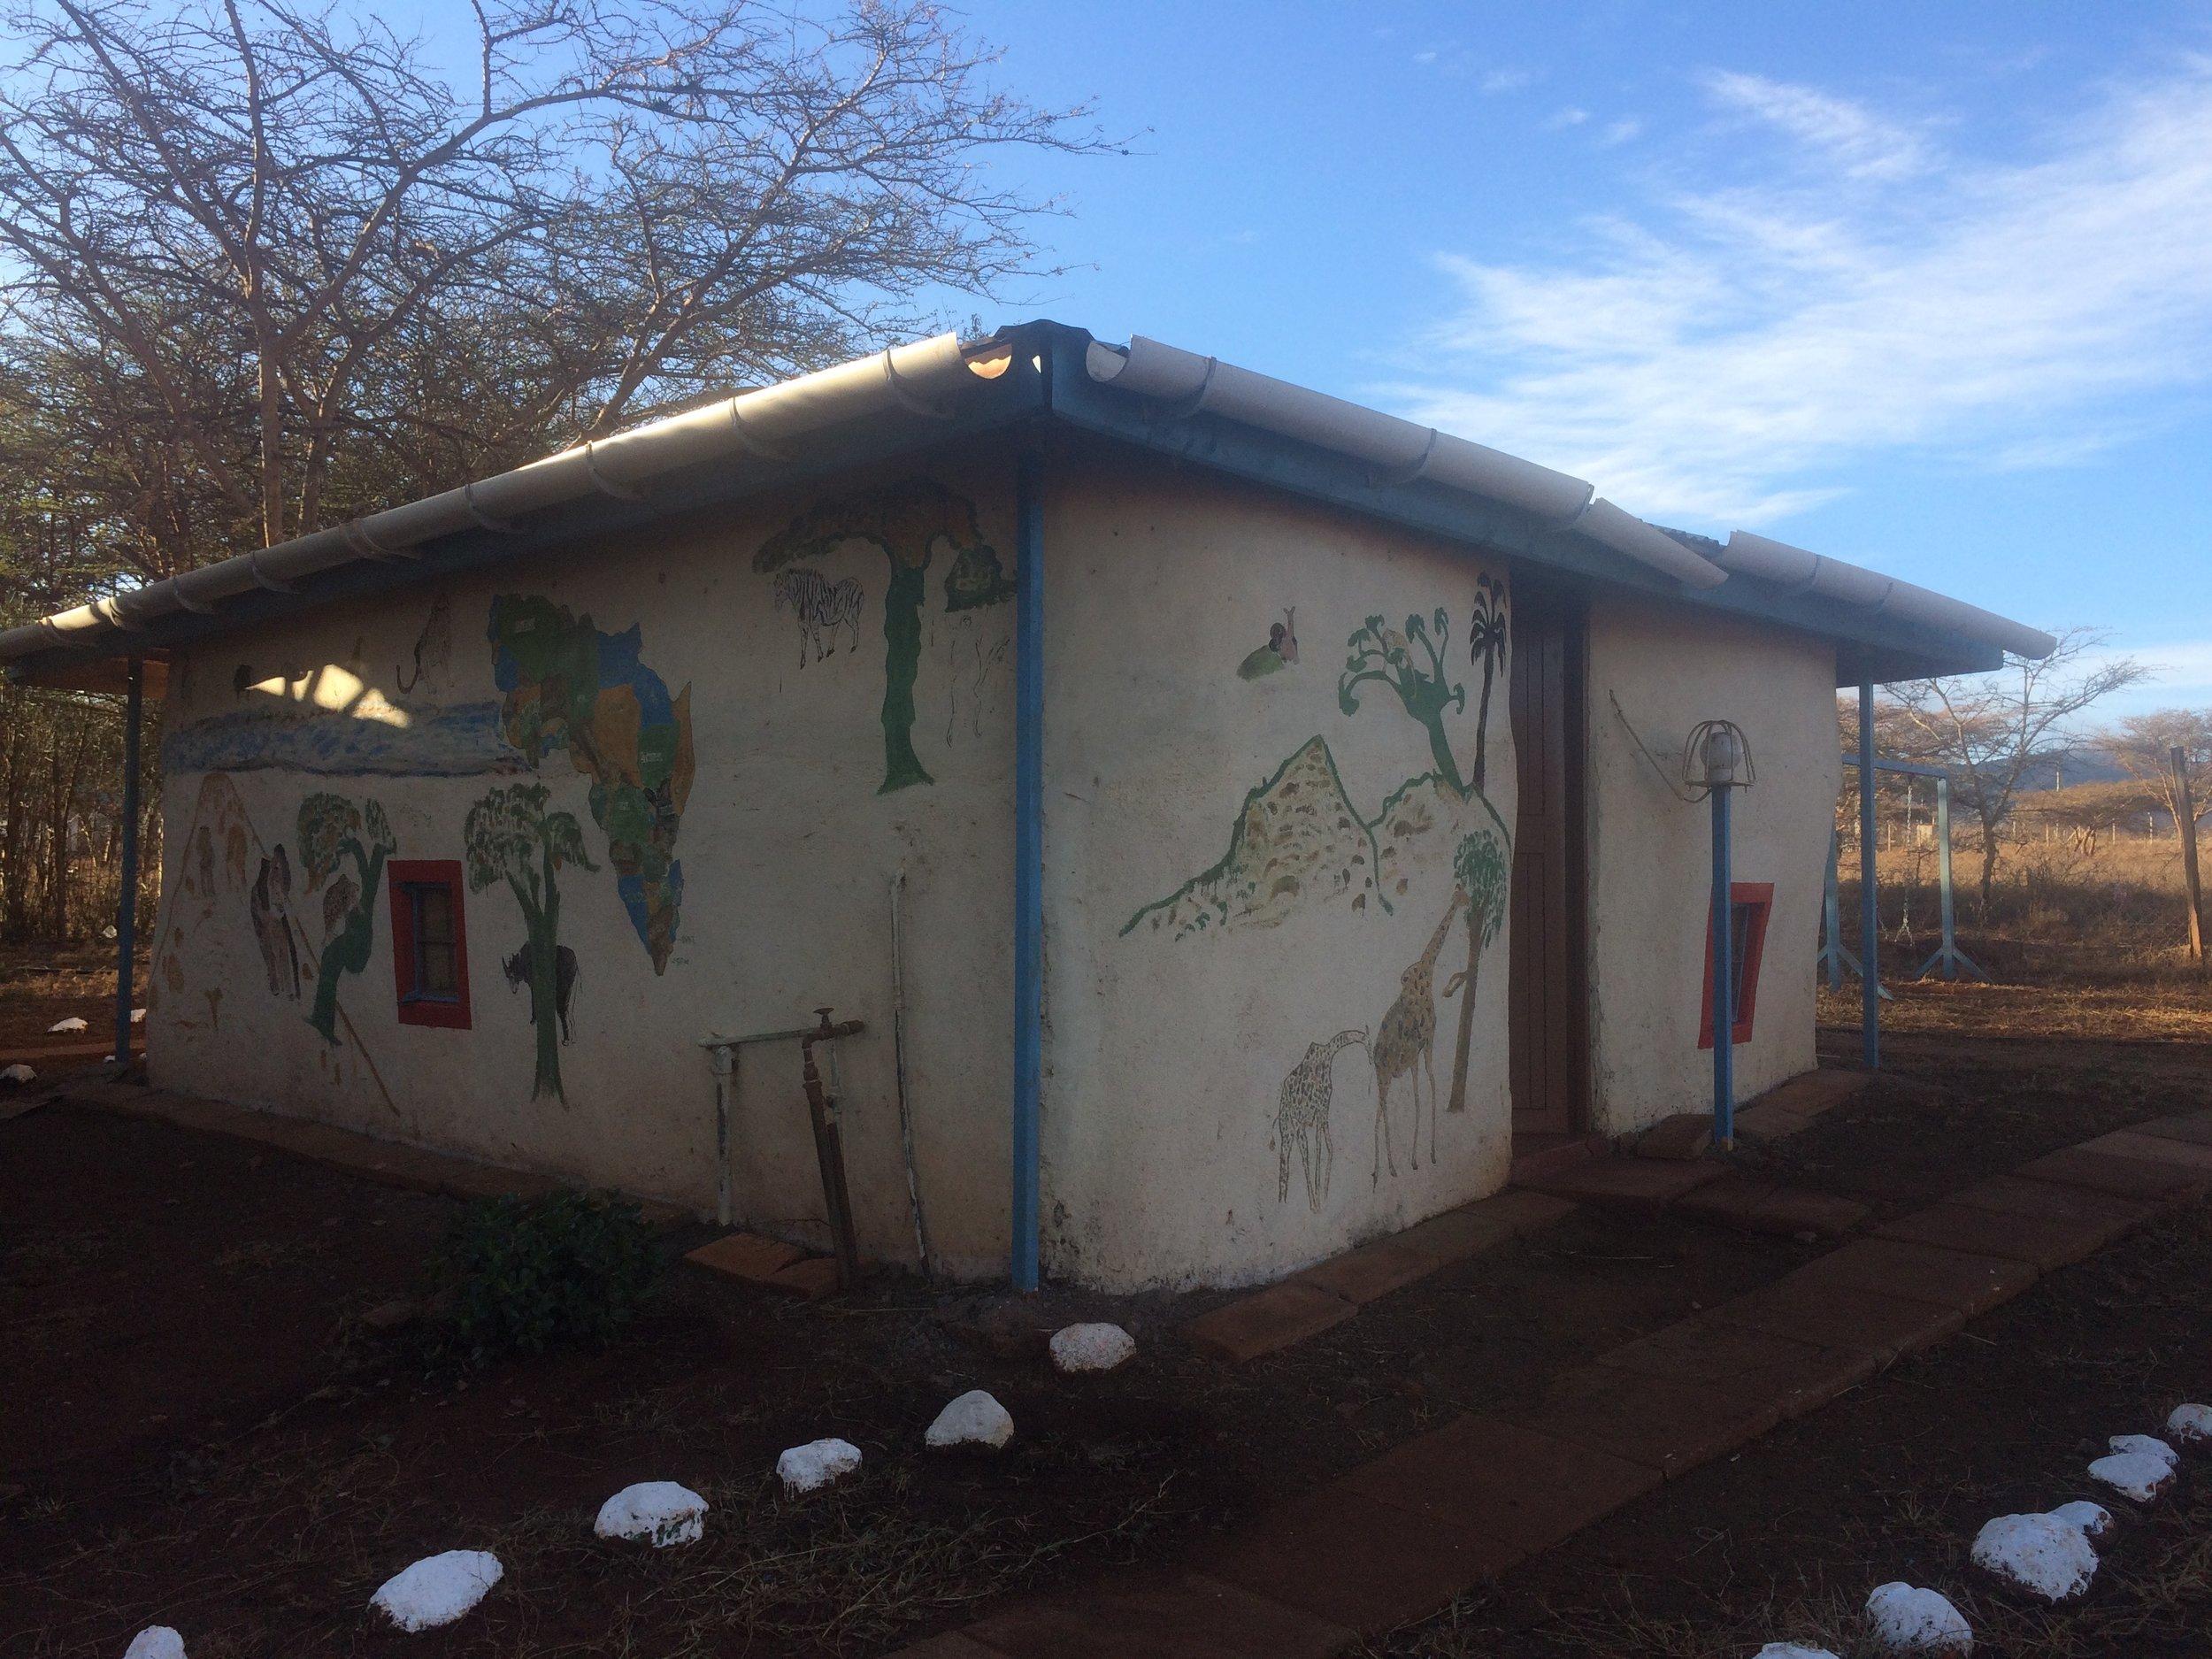 Camp Henry Dorm Hut